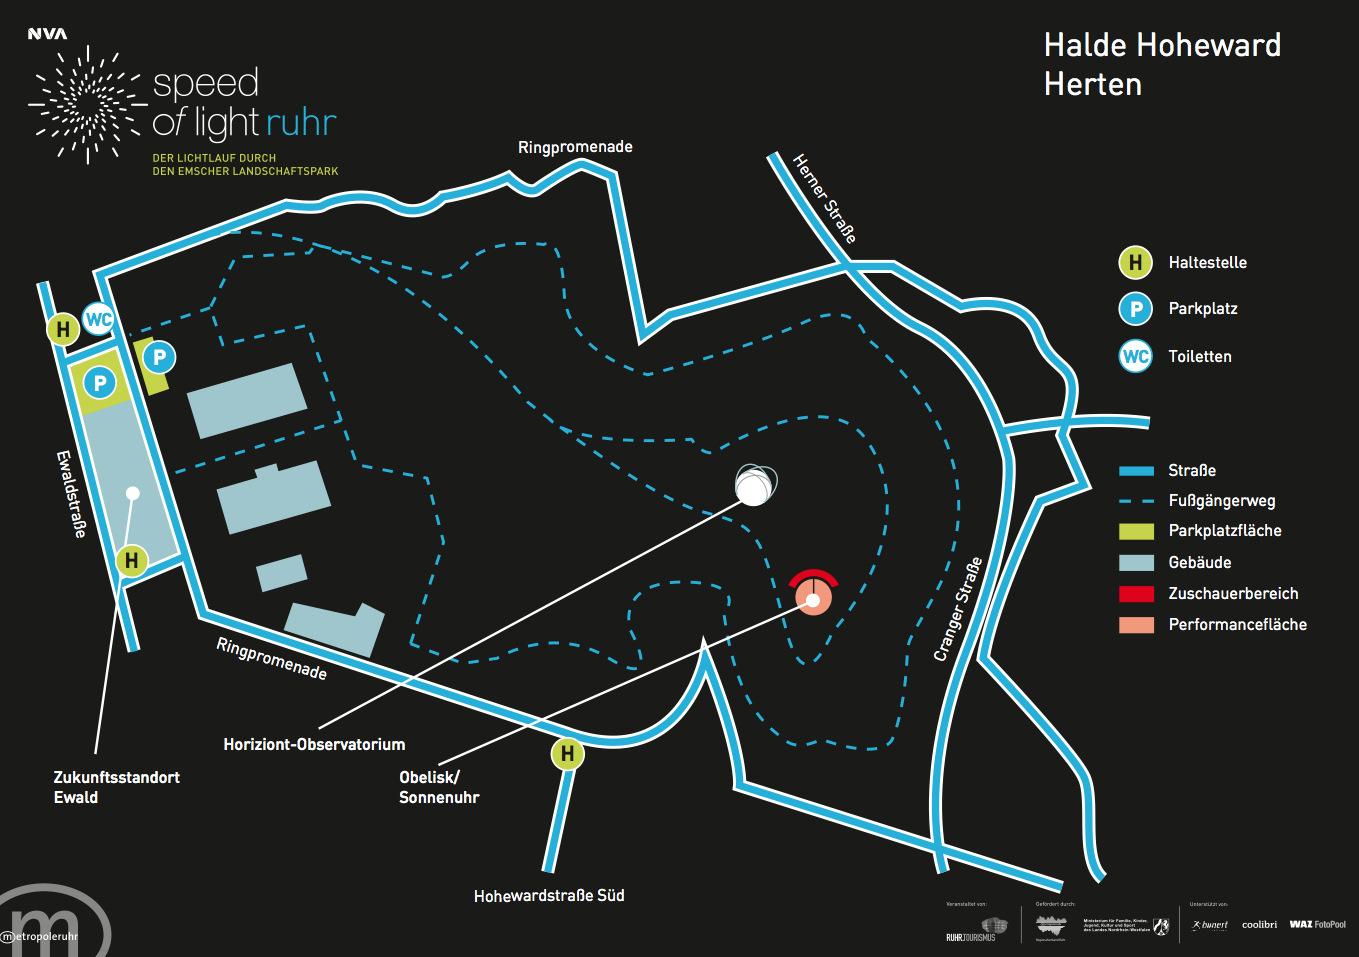 Halde Hoheward Speed of Light Ruhr Ruhrgebiet NVA nvasol